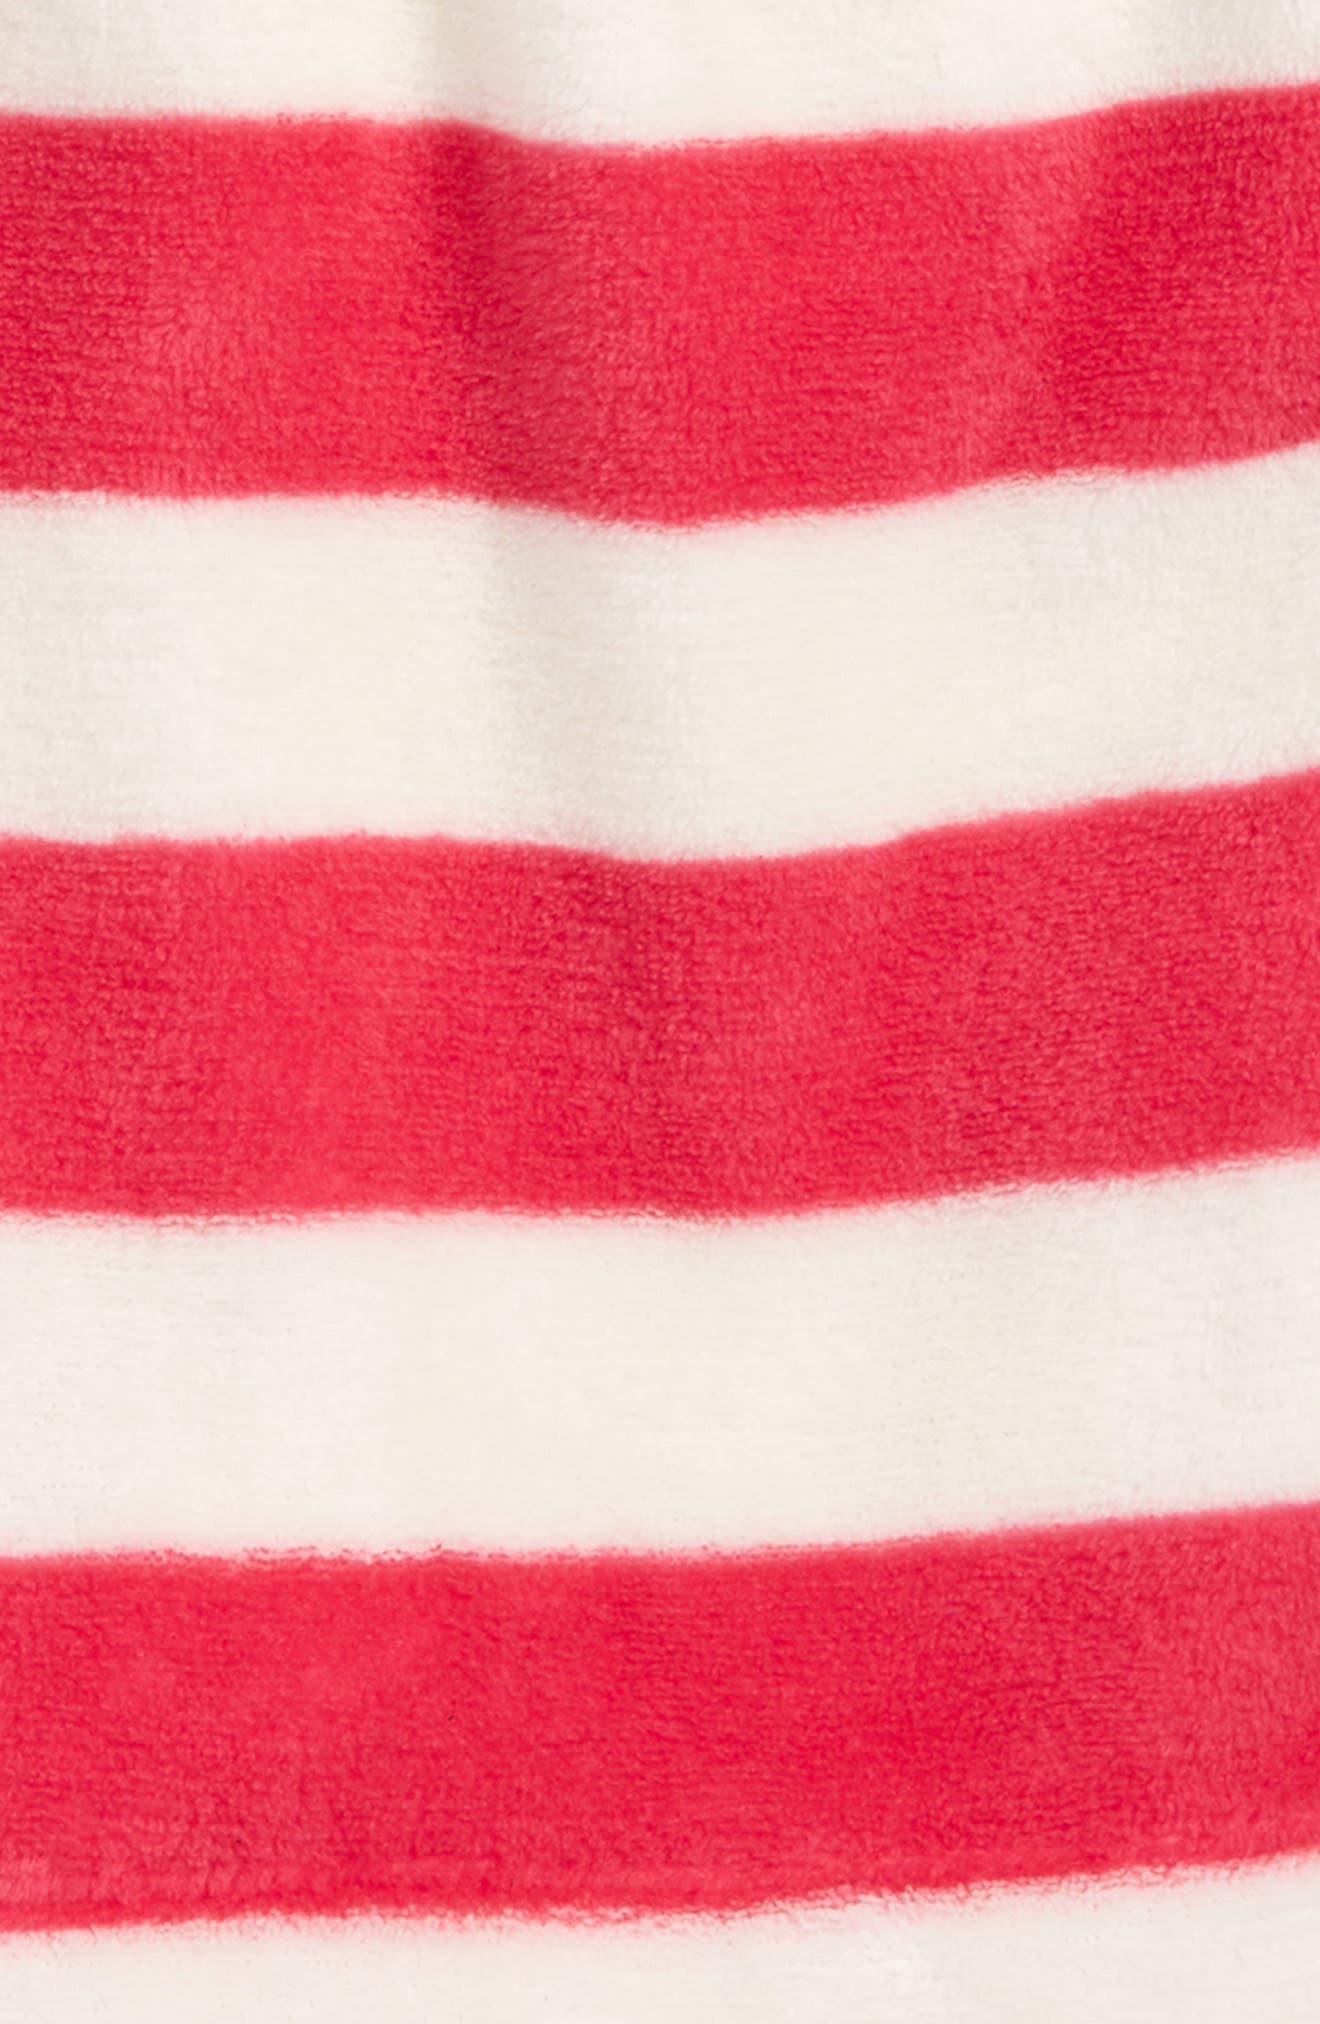 Fleece Sleep Shorts,                             Alternate thumbnail 2, color,                             PINK MAGENTA STRIPE